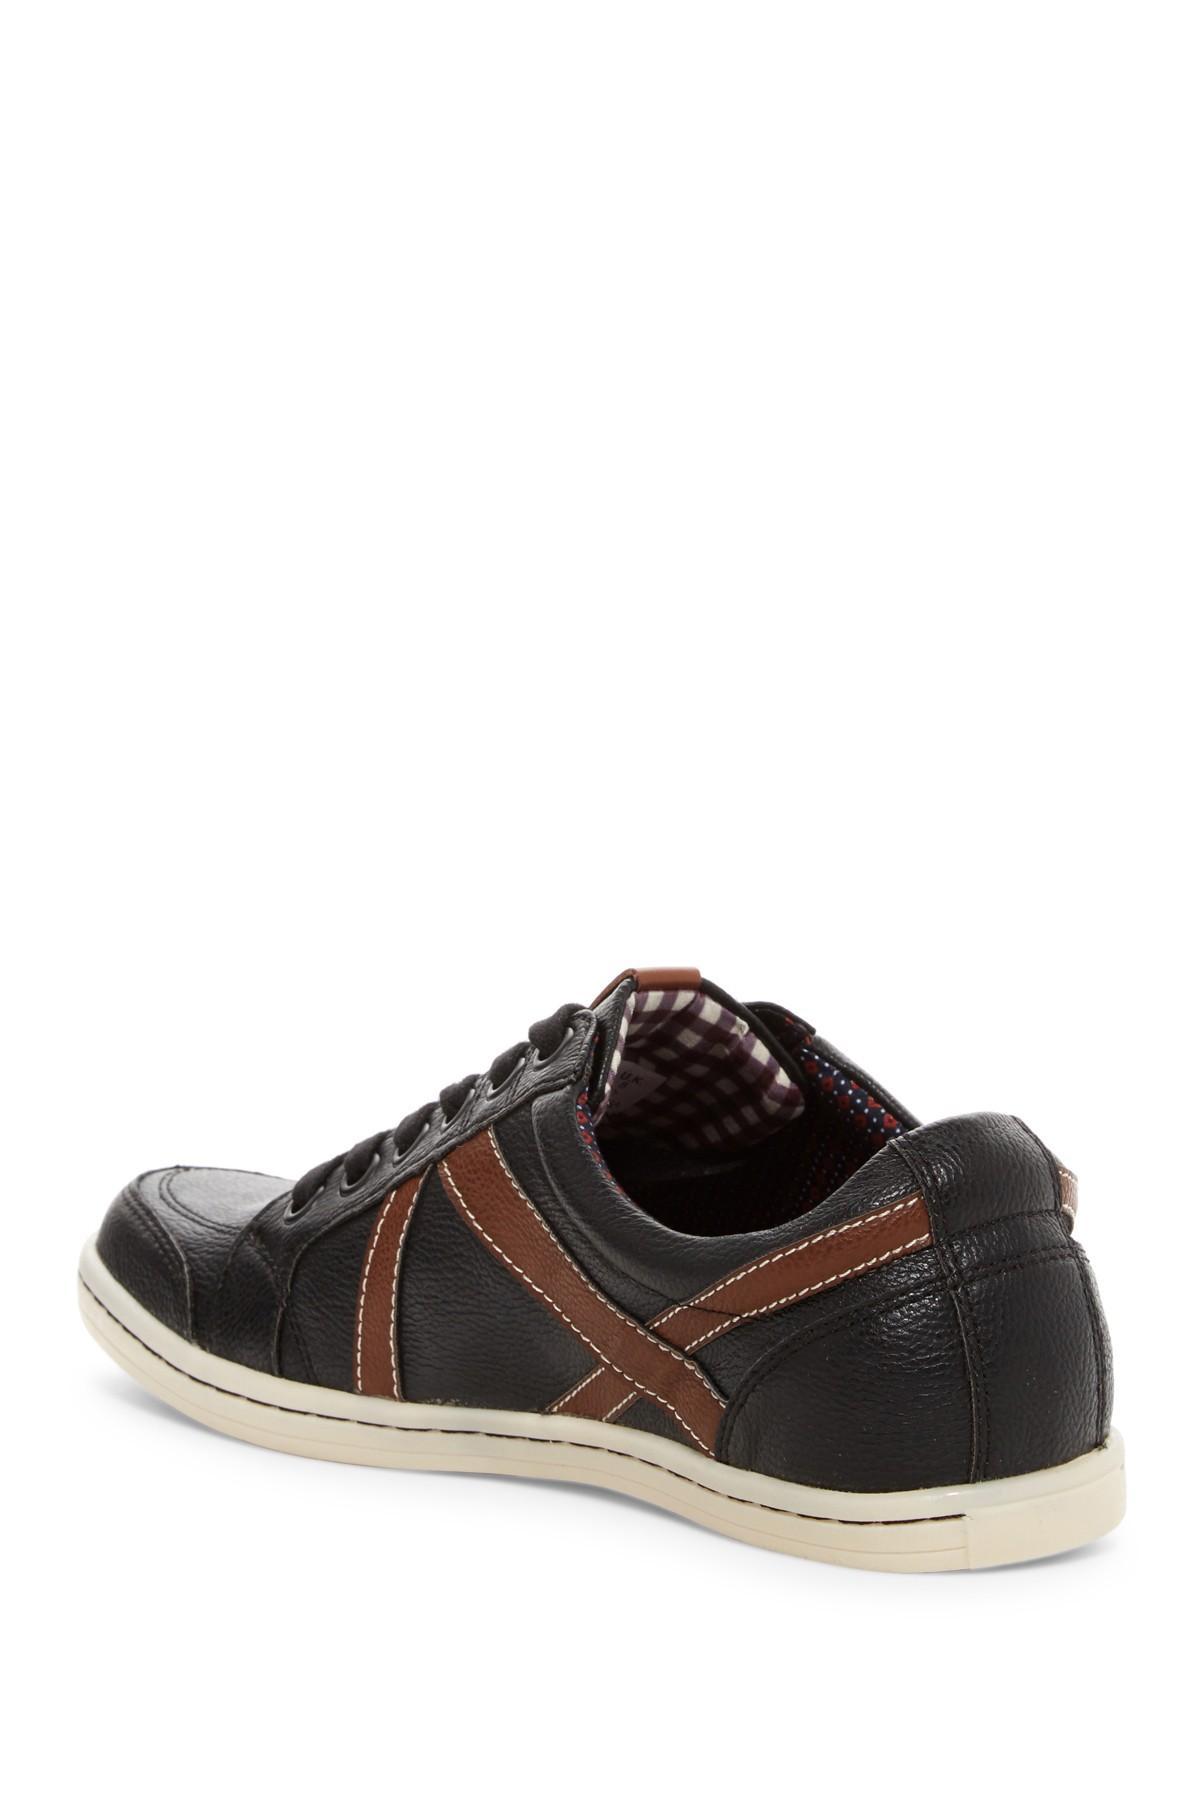 lyst ben sherman knox sneaker in black for men